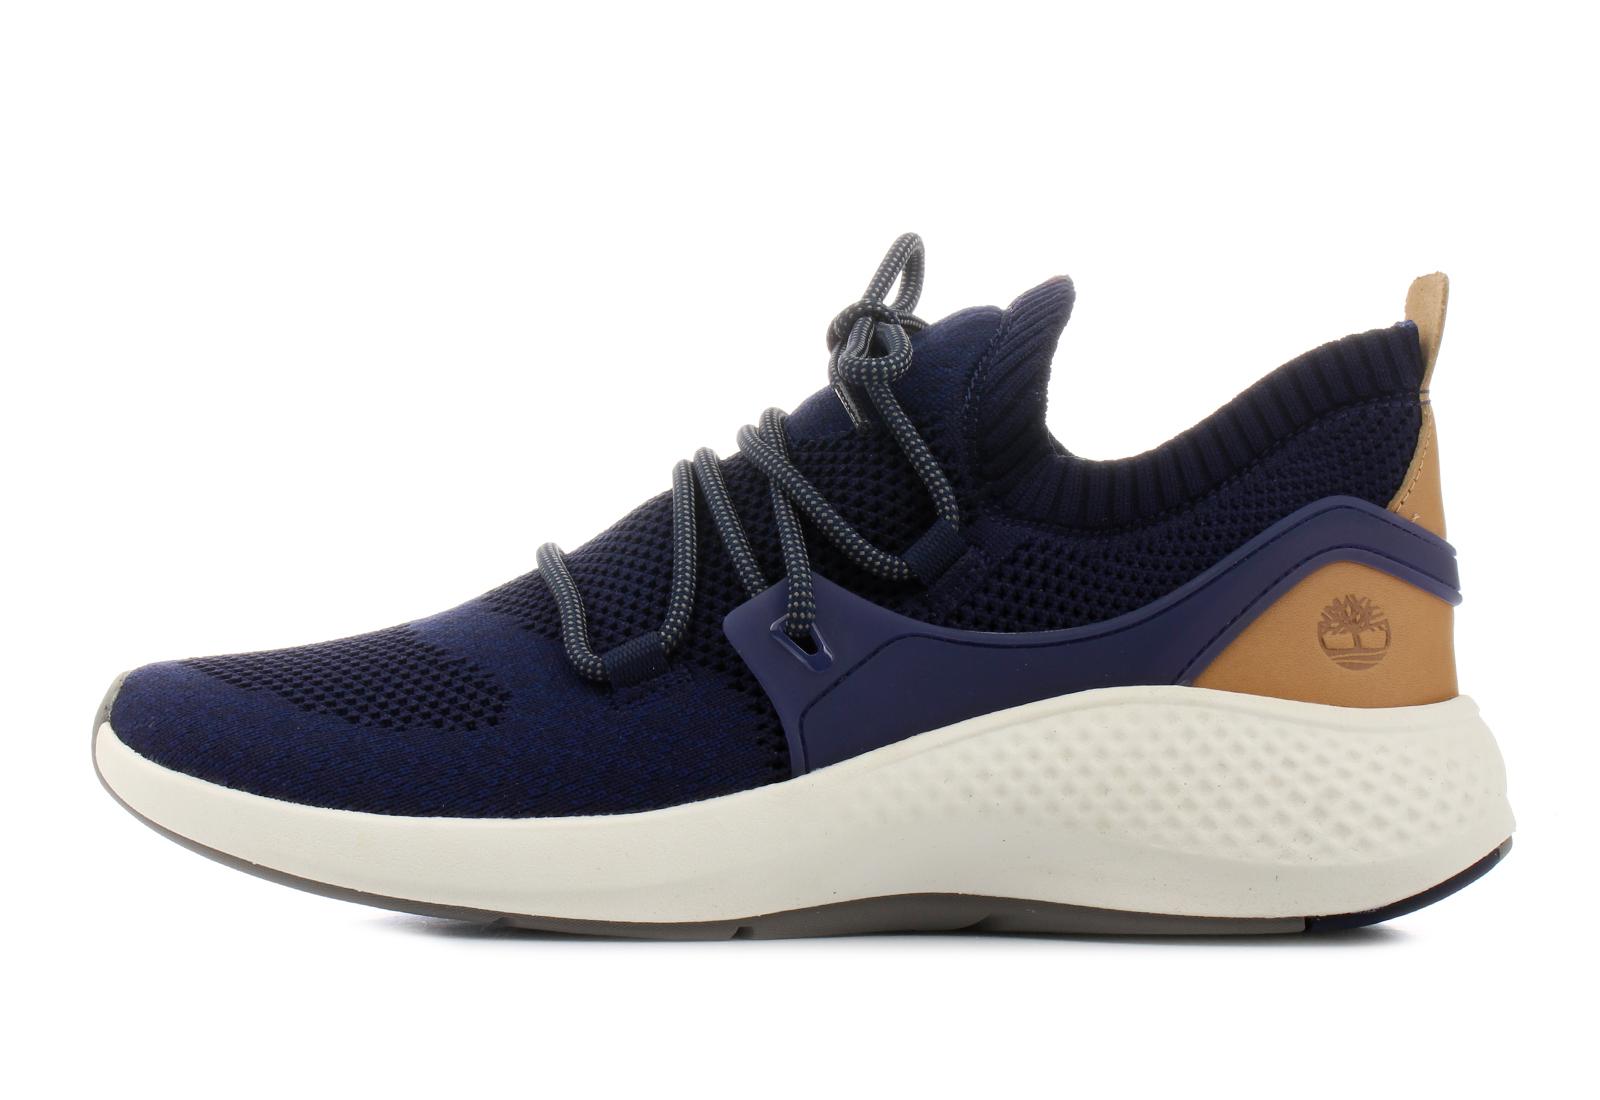 Timberland Shoes Flyroam Go A1qao Nvy Online Shop